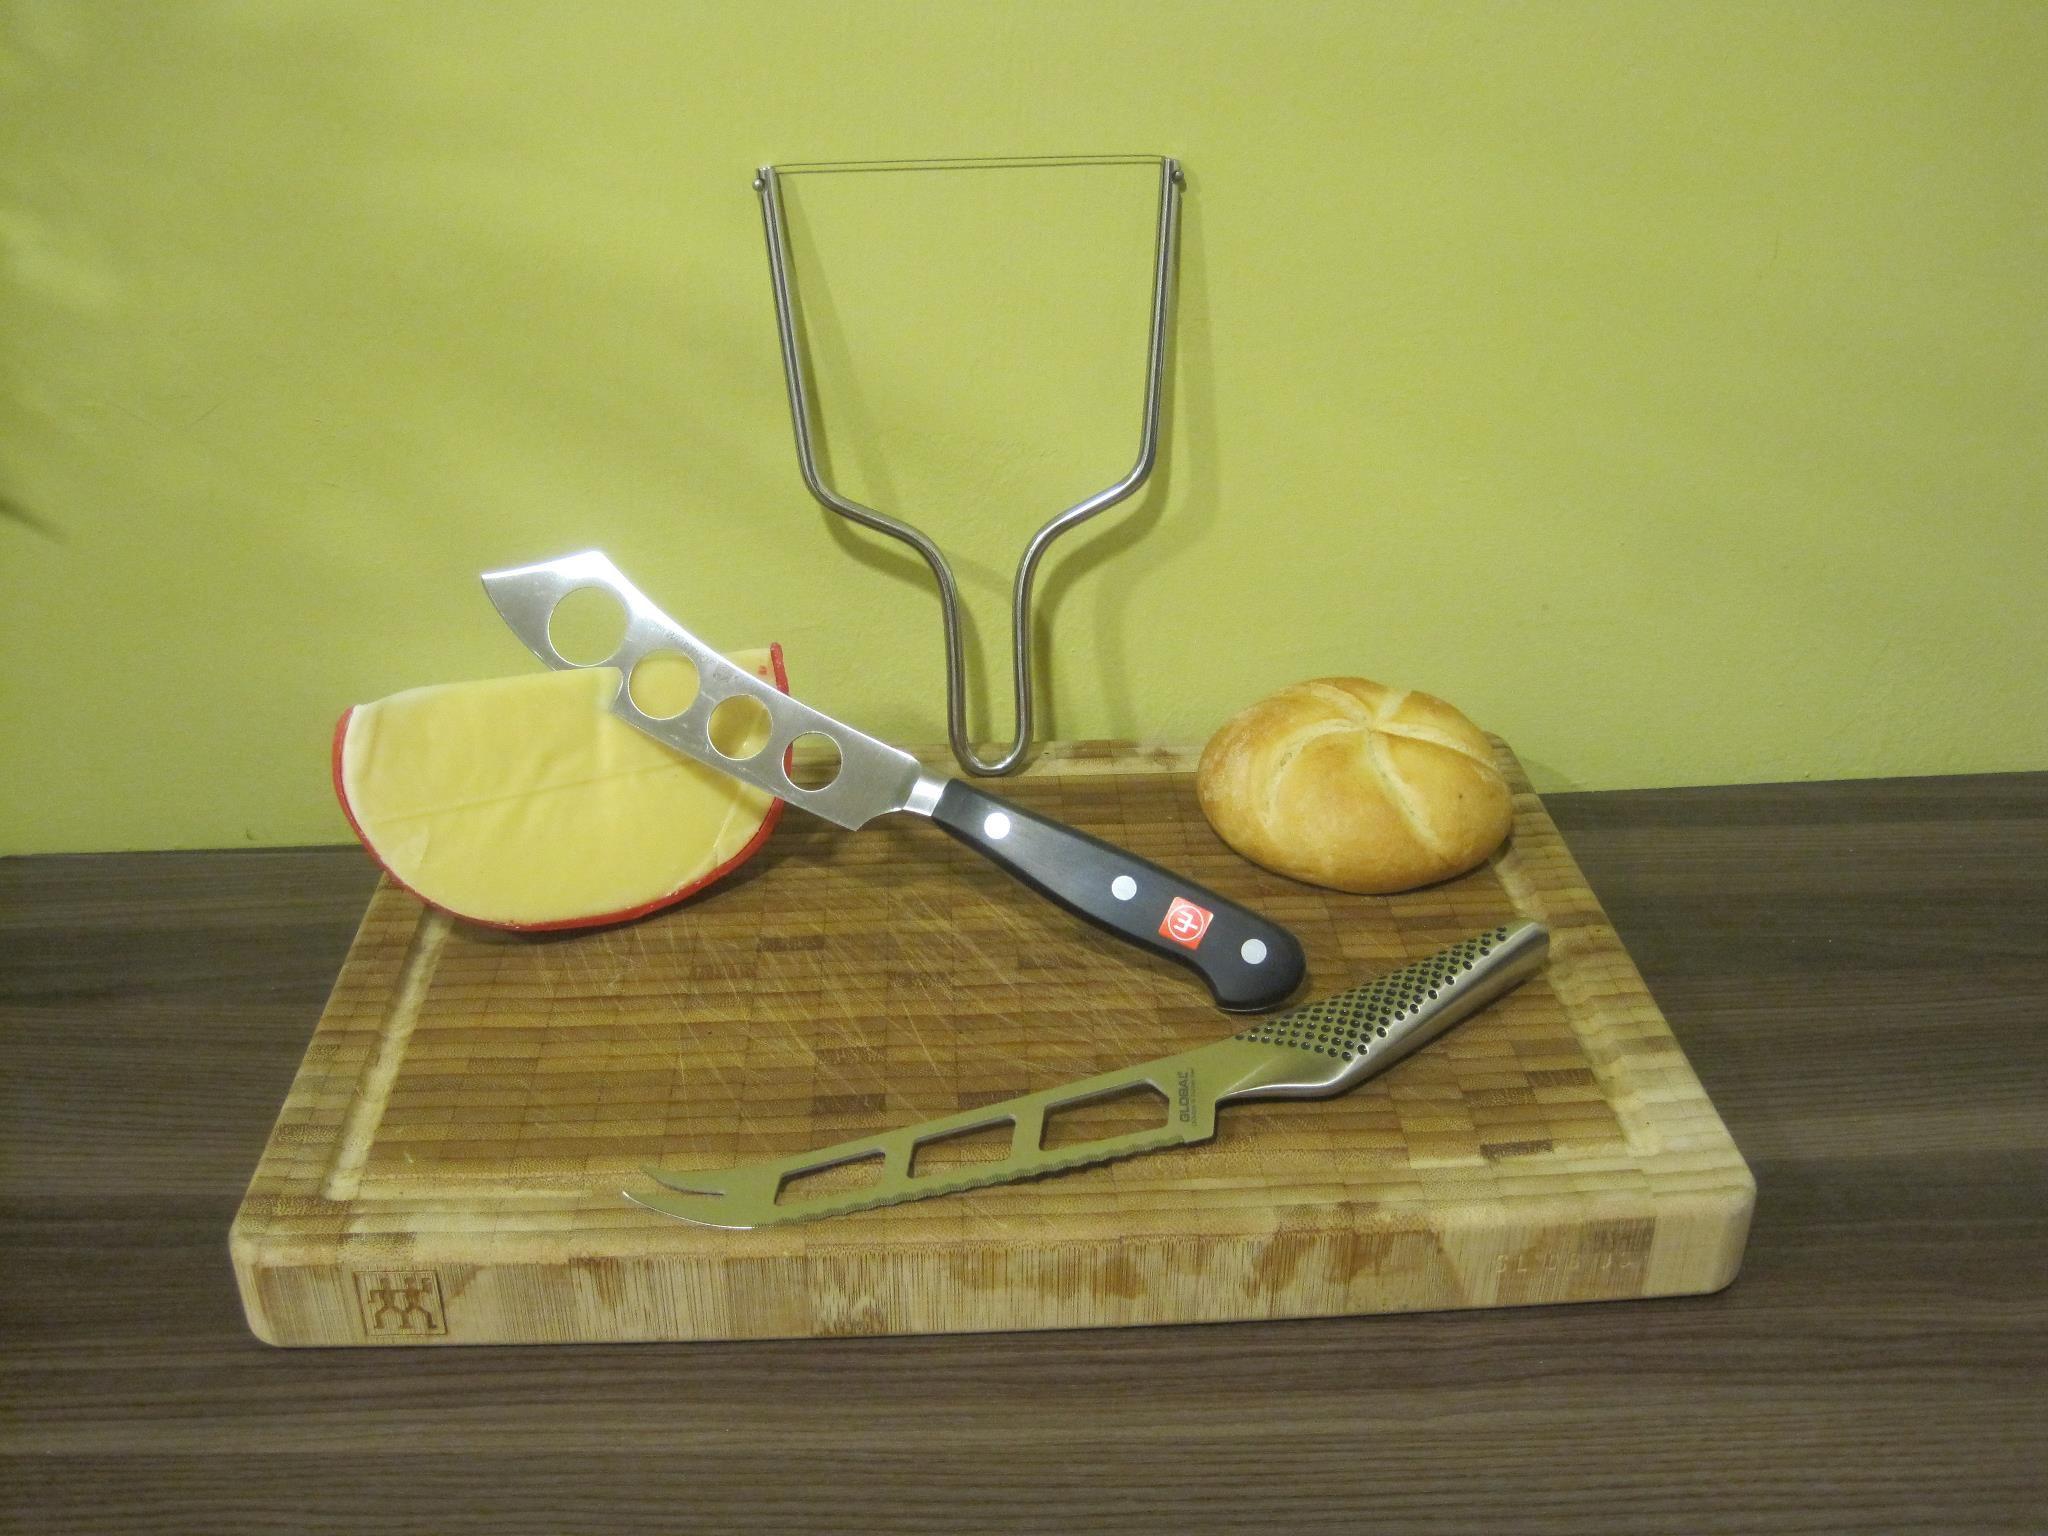 Foto 32 de Knives and penknives en Zaragoza | San Gil cutlery